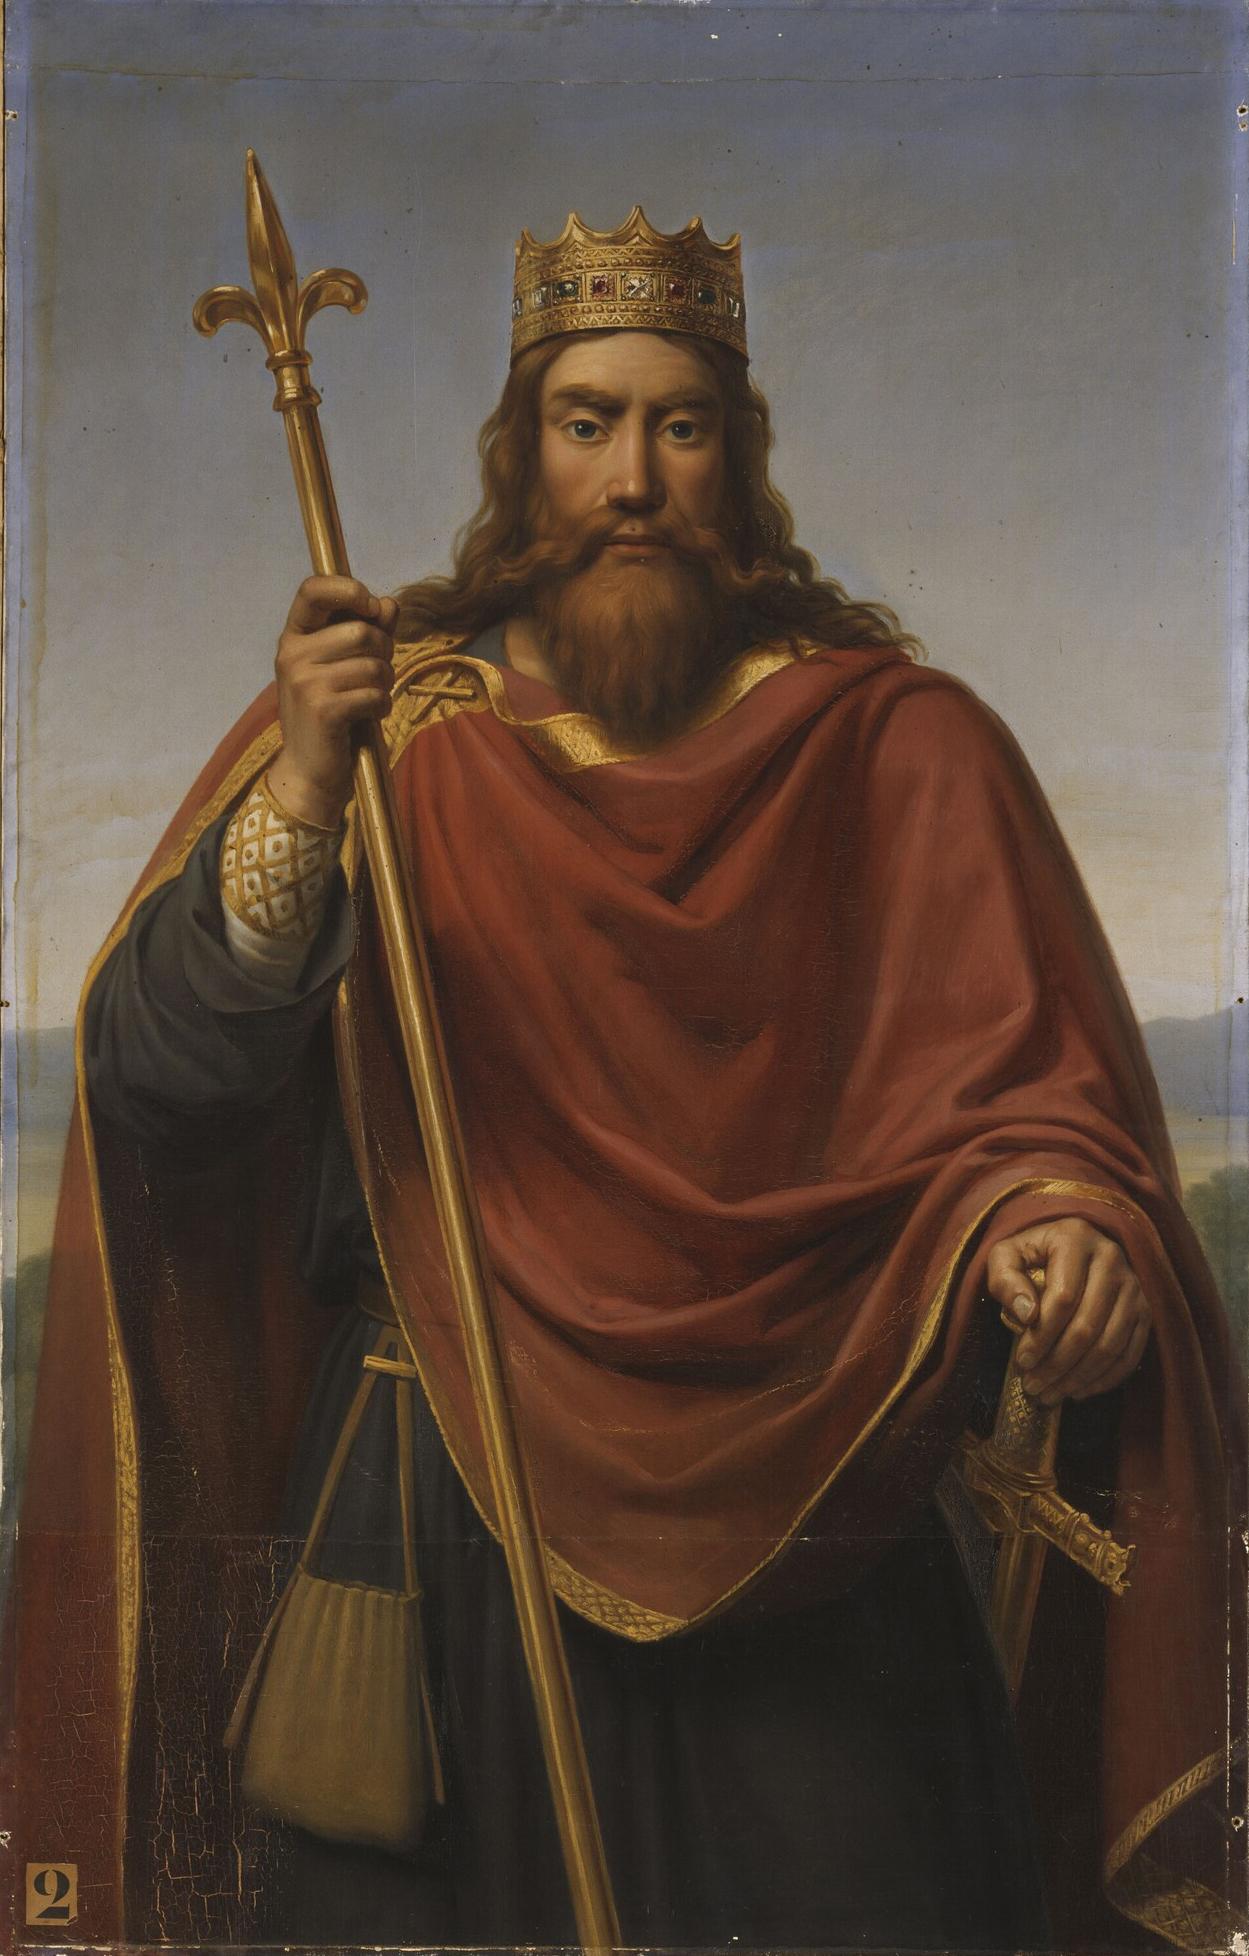 http://upload.wikimedia.org/wikipedia/commons/8/86/Fran%C3%A7ois-Louis_Dejuinne_(1786-1844)_-_Clovis_roi_des_Francs_(465-511).jpg